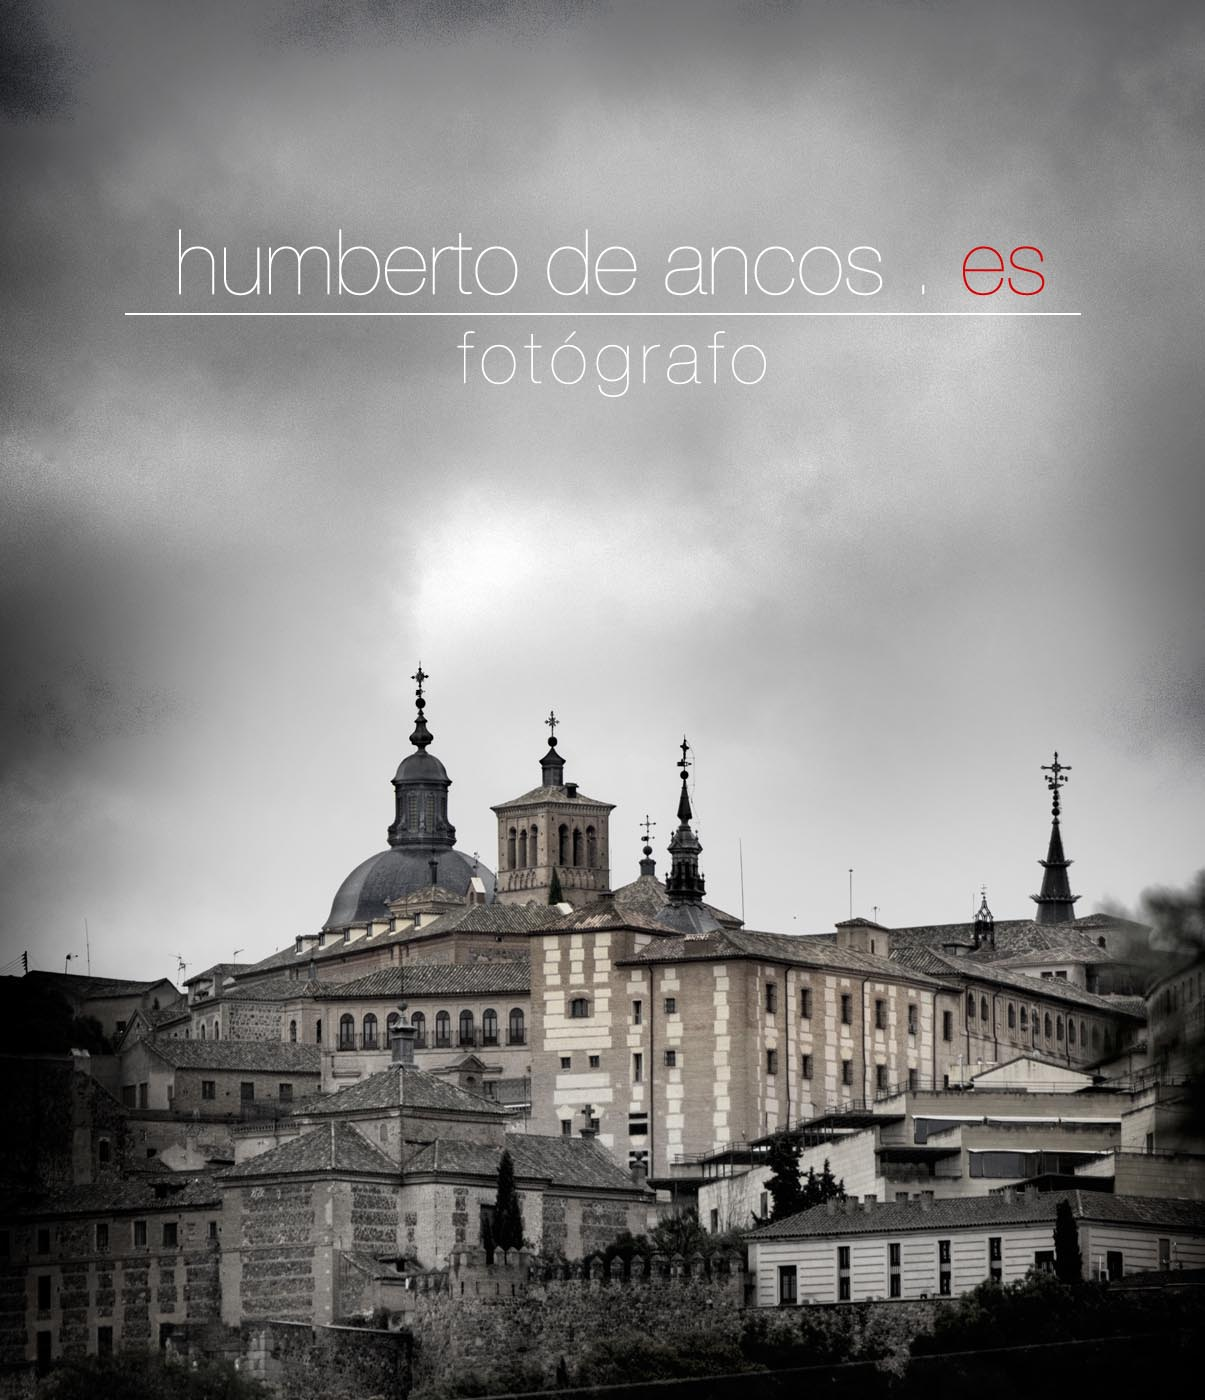 Panorámica de Toledo, Humberto de Ancos, Fotógrafo profesional